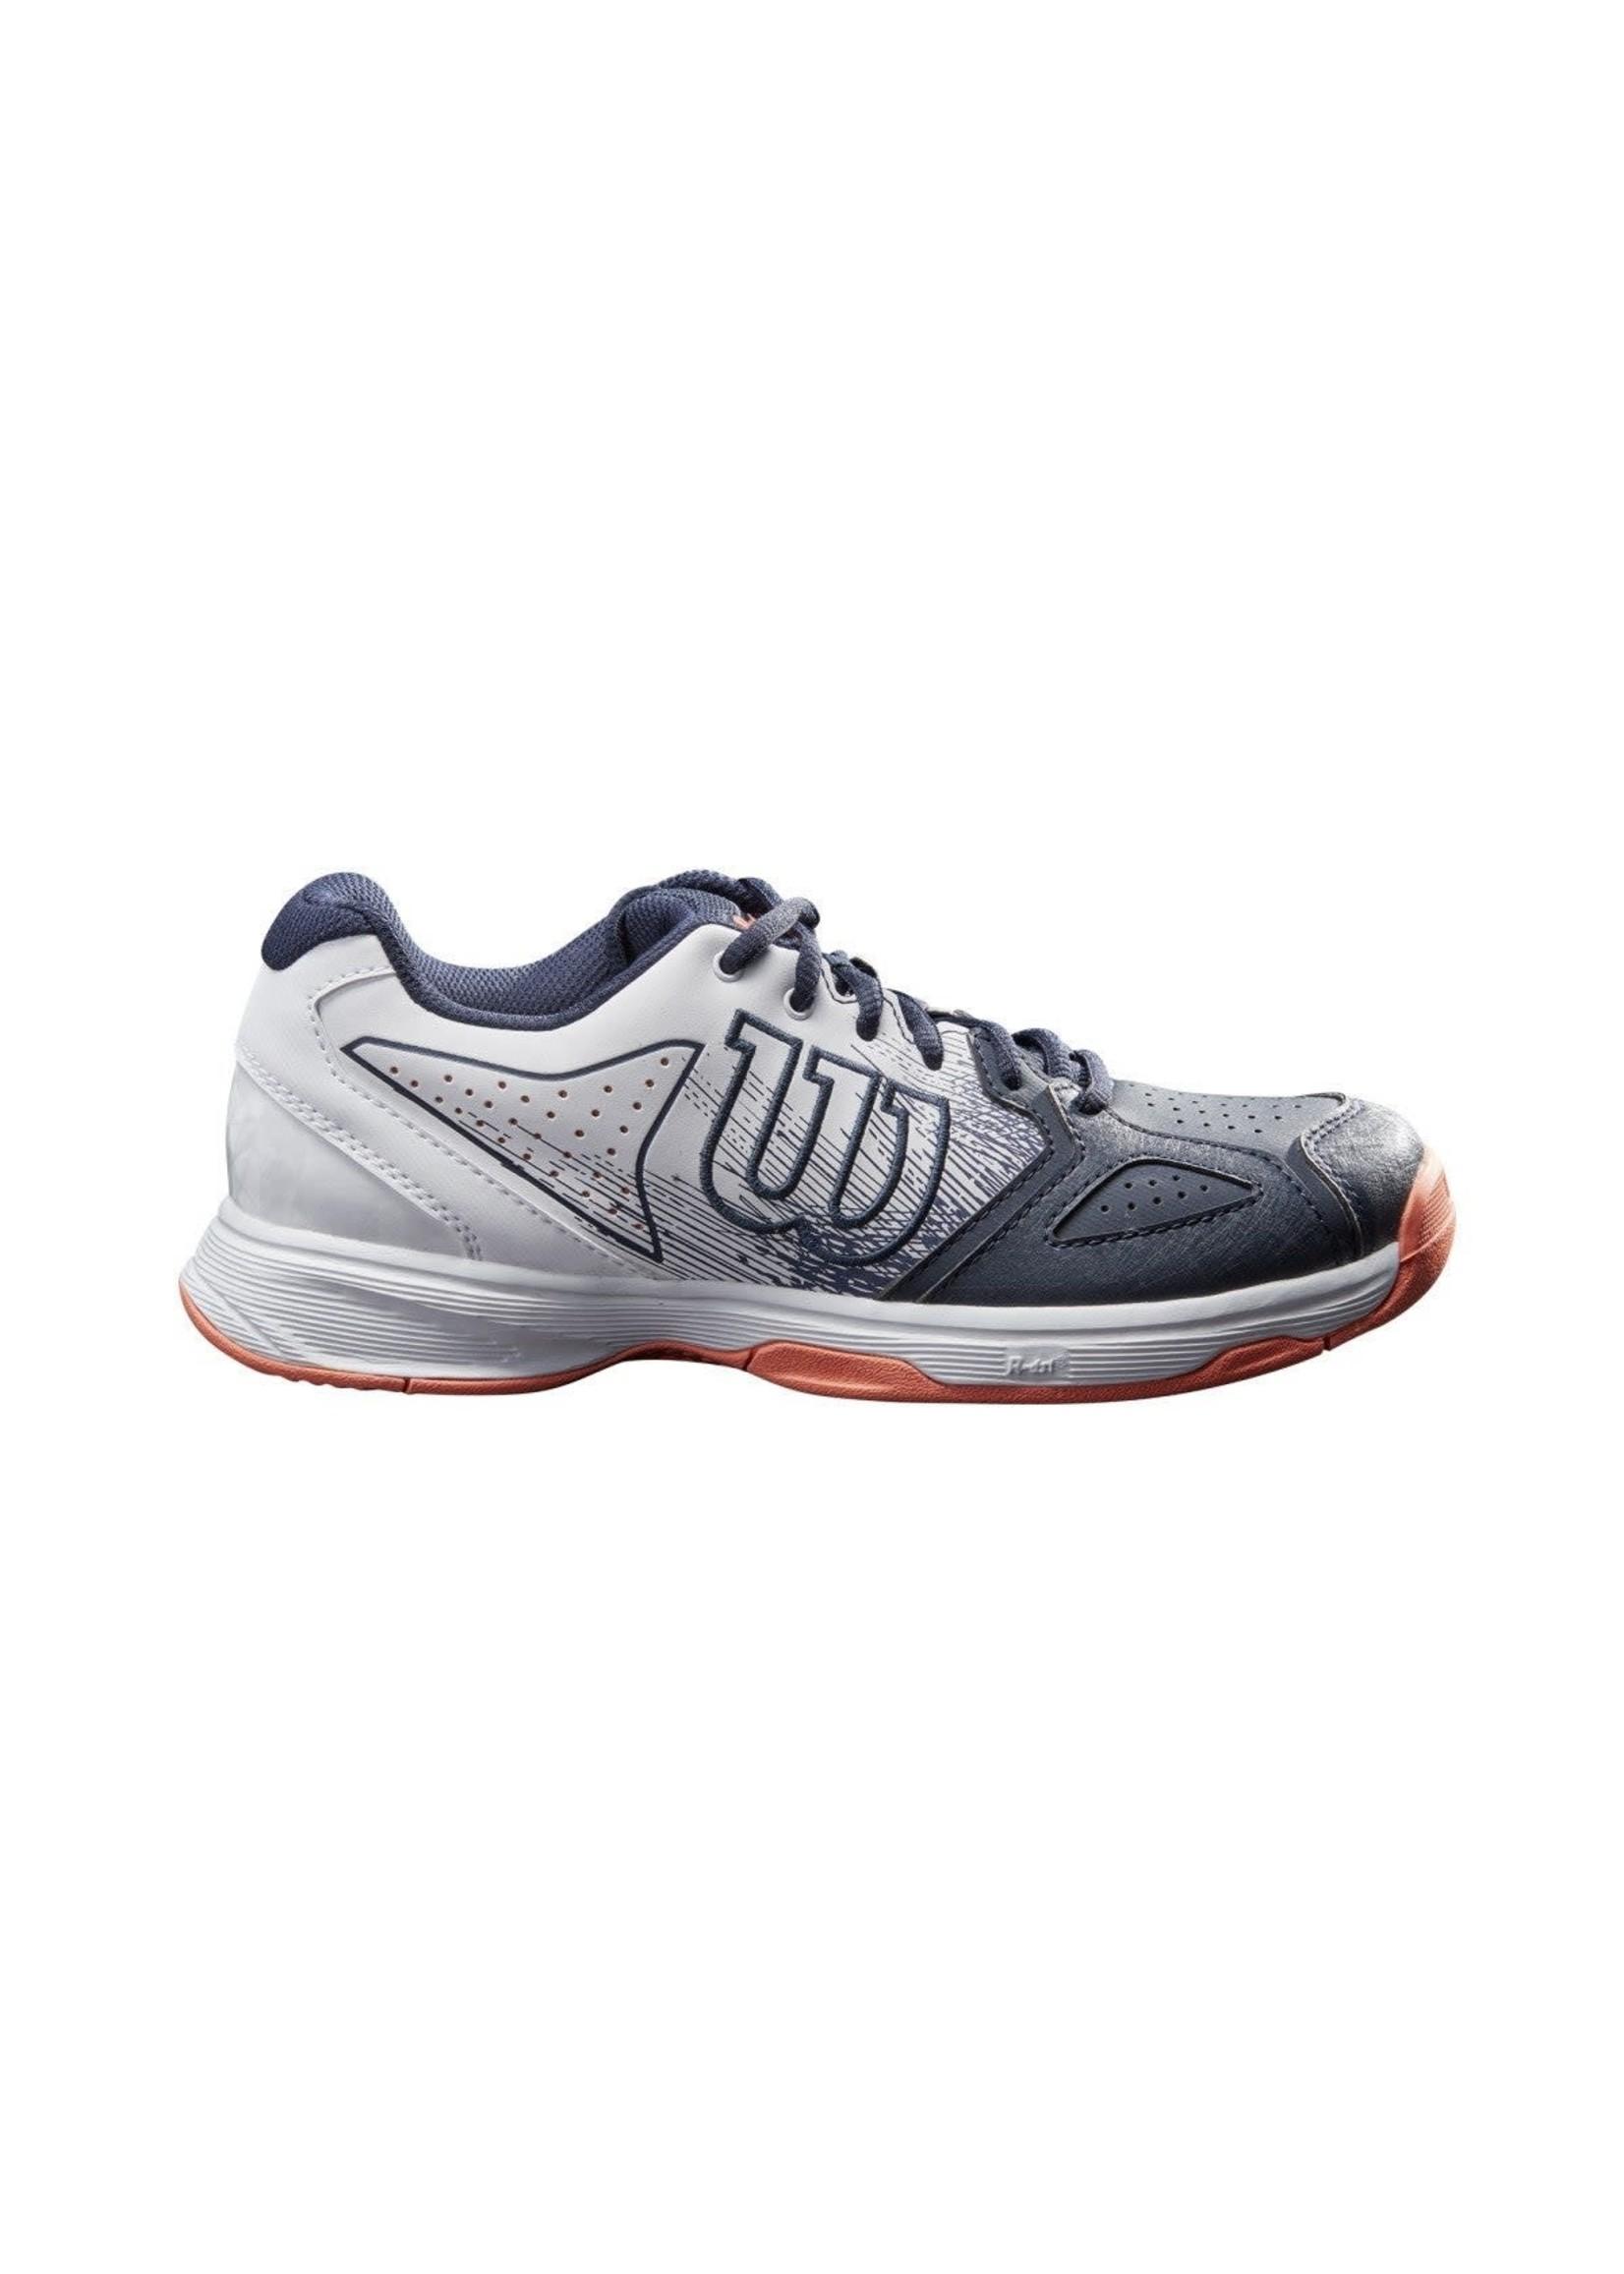 Wilson Wilson Kaos Stroke Ladies Tennis Shoe (2021)